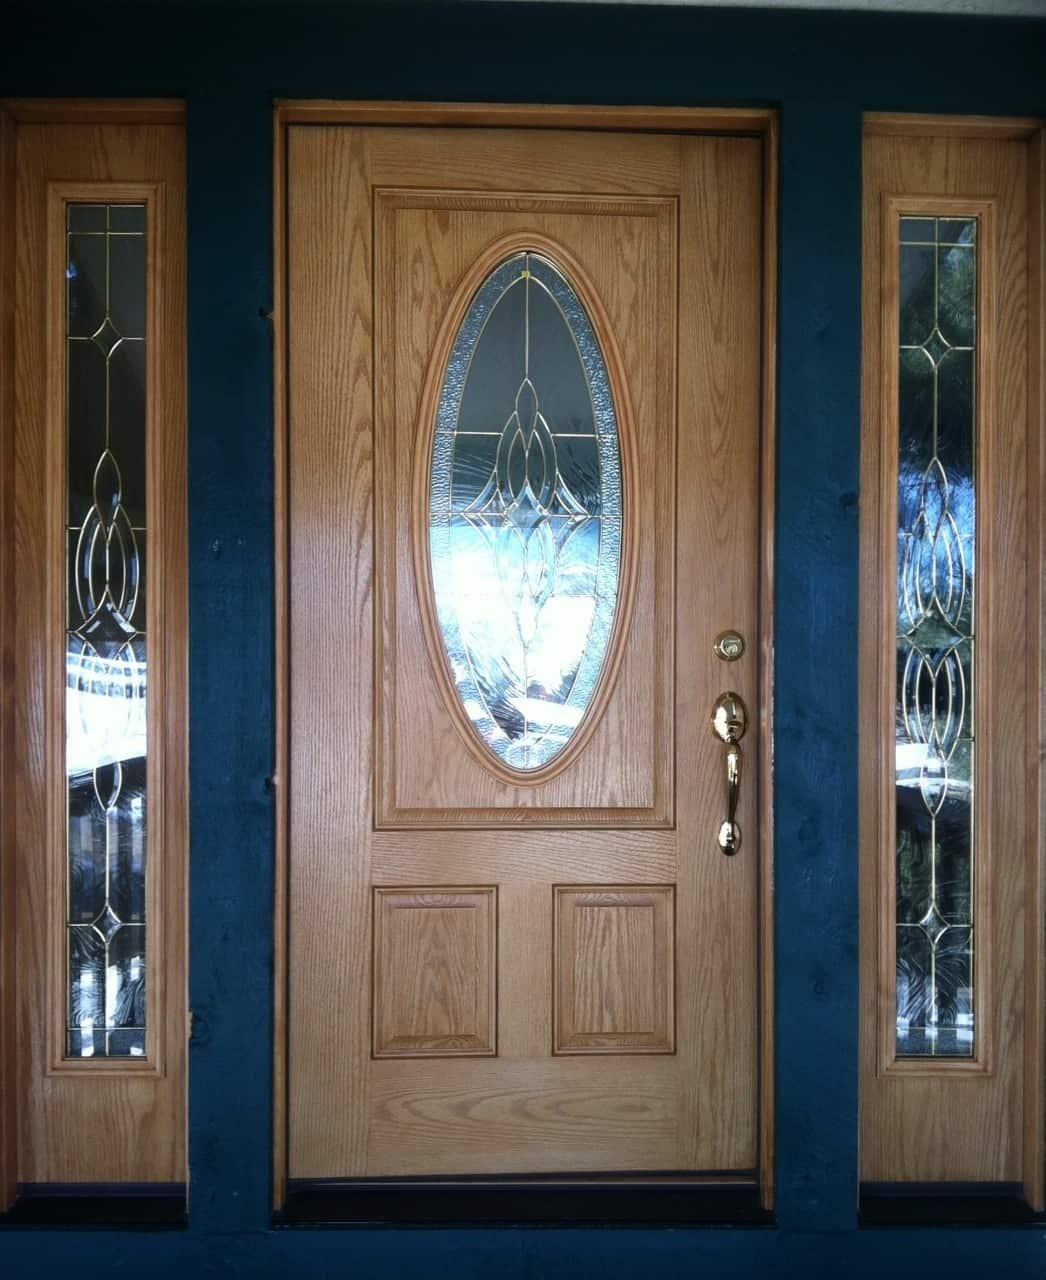 Dun-Rite Home Improvements, Inc